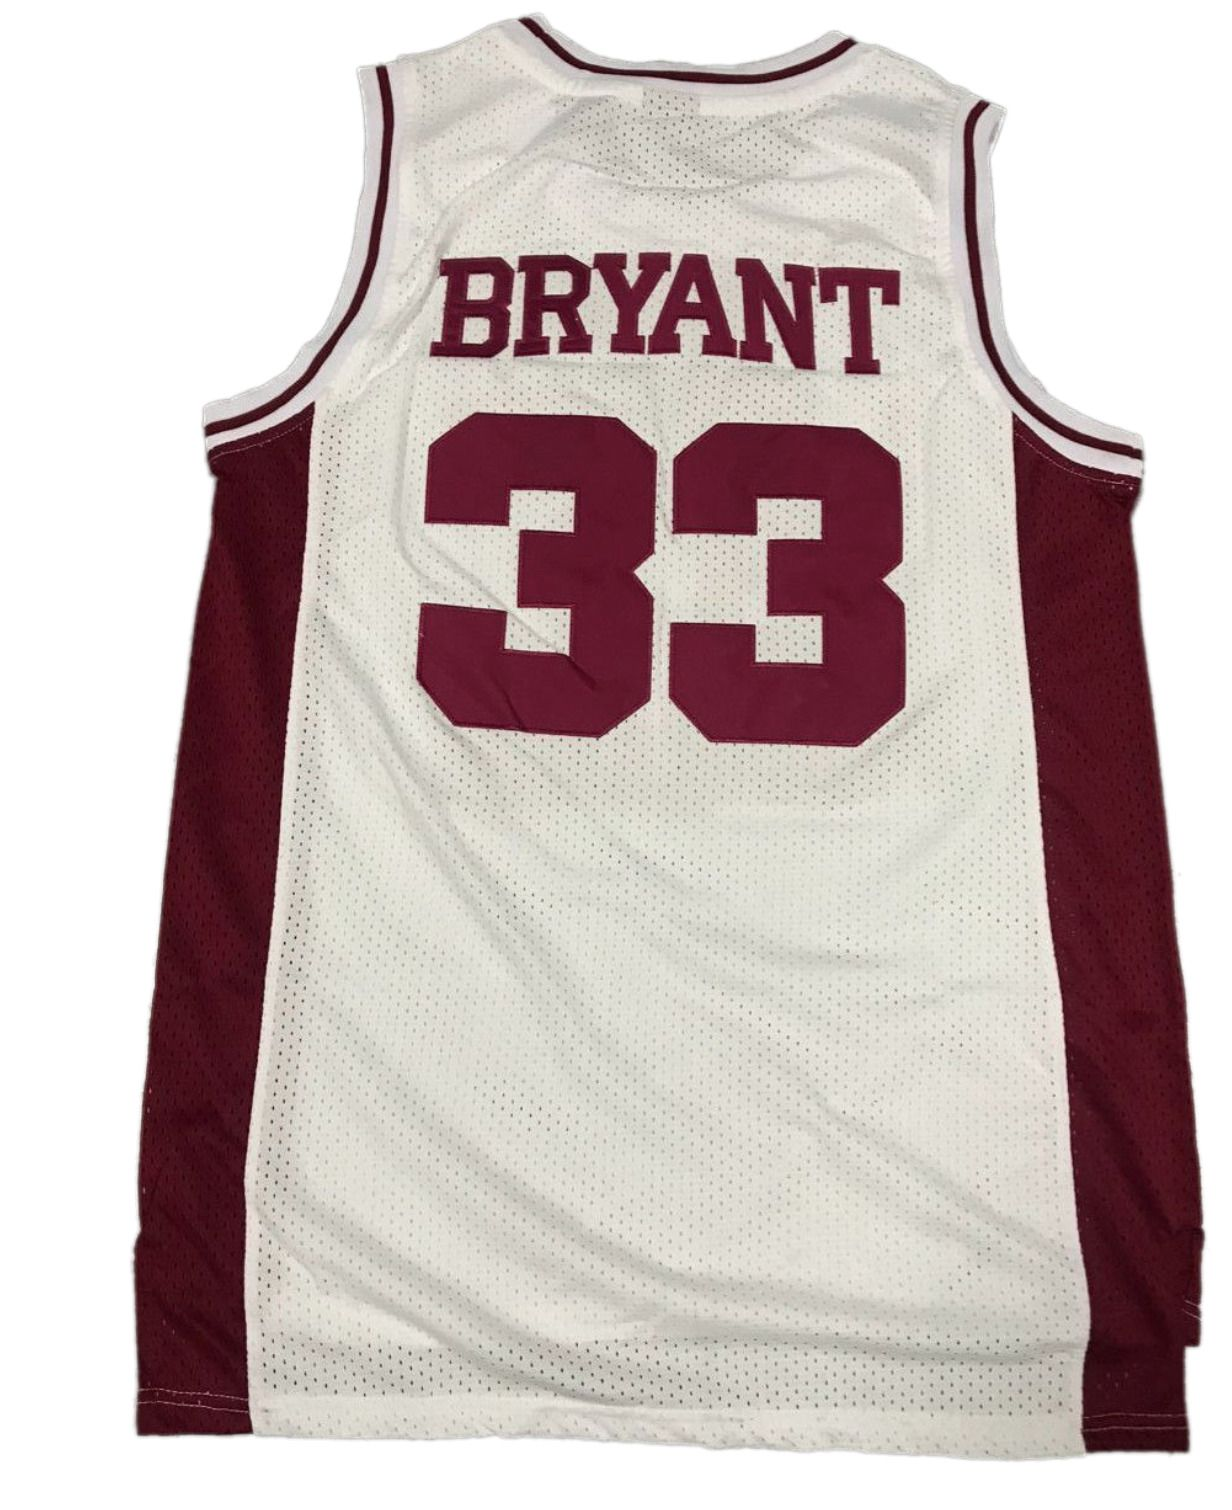 eb191debe Kobe Bryant  33 Lower Merion High School Basketball Jersey  14.99 End Date   2018-